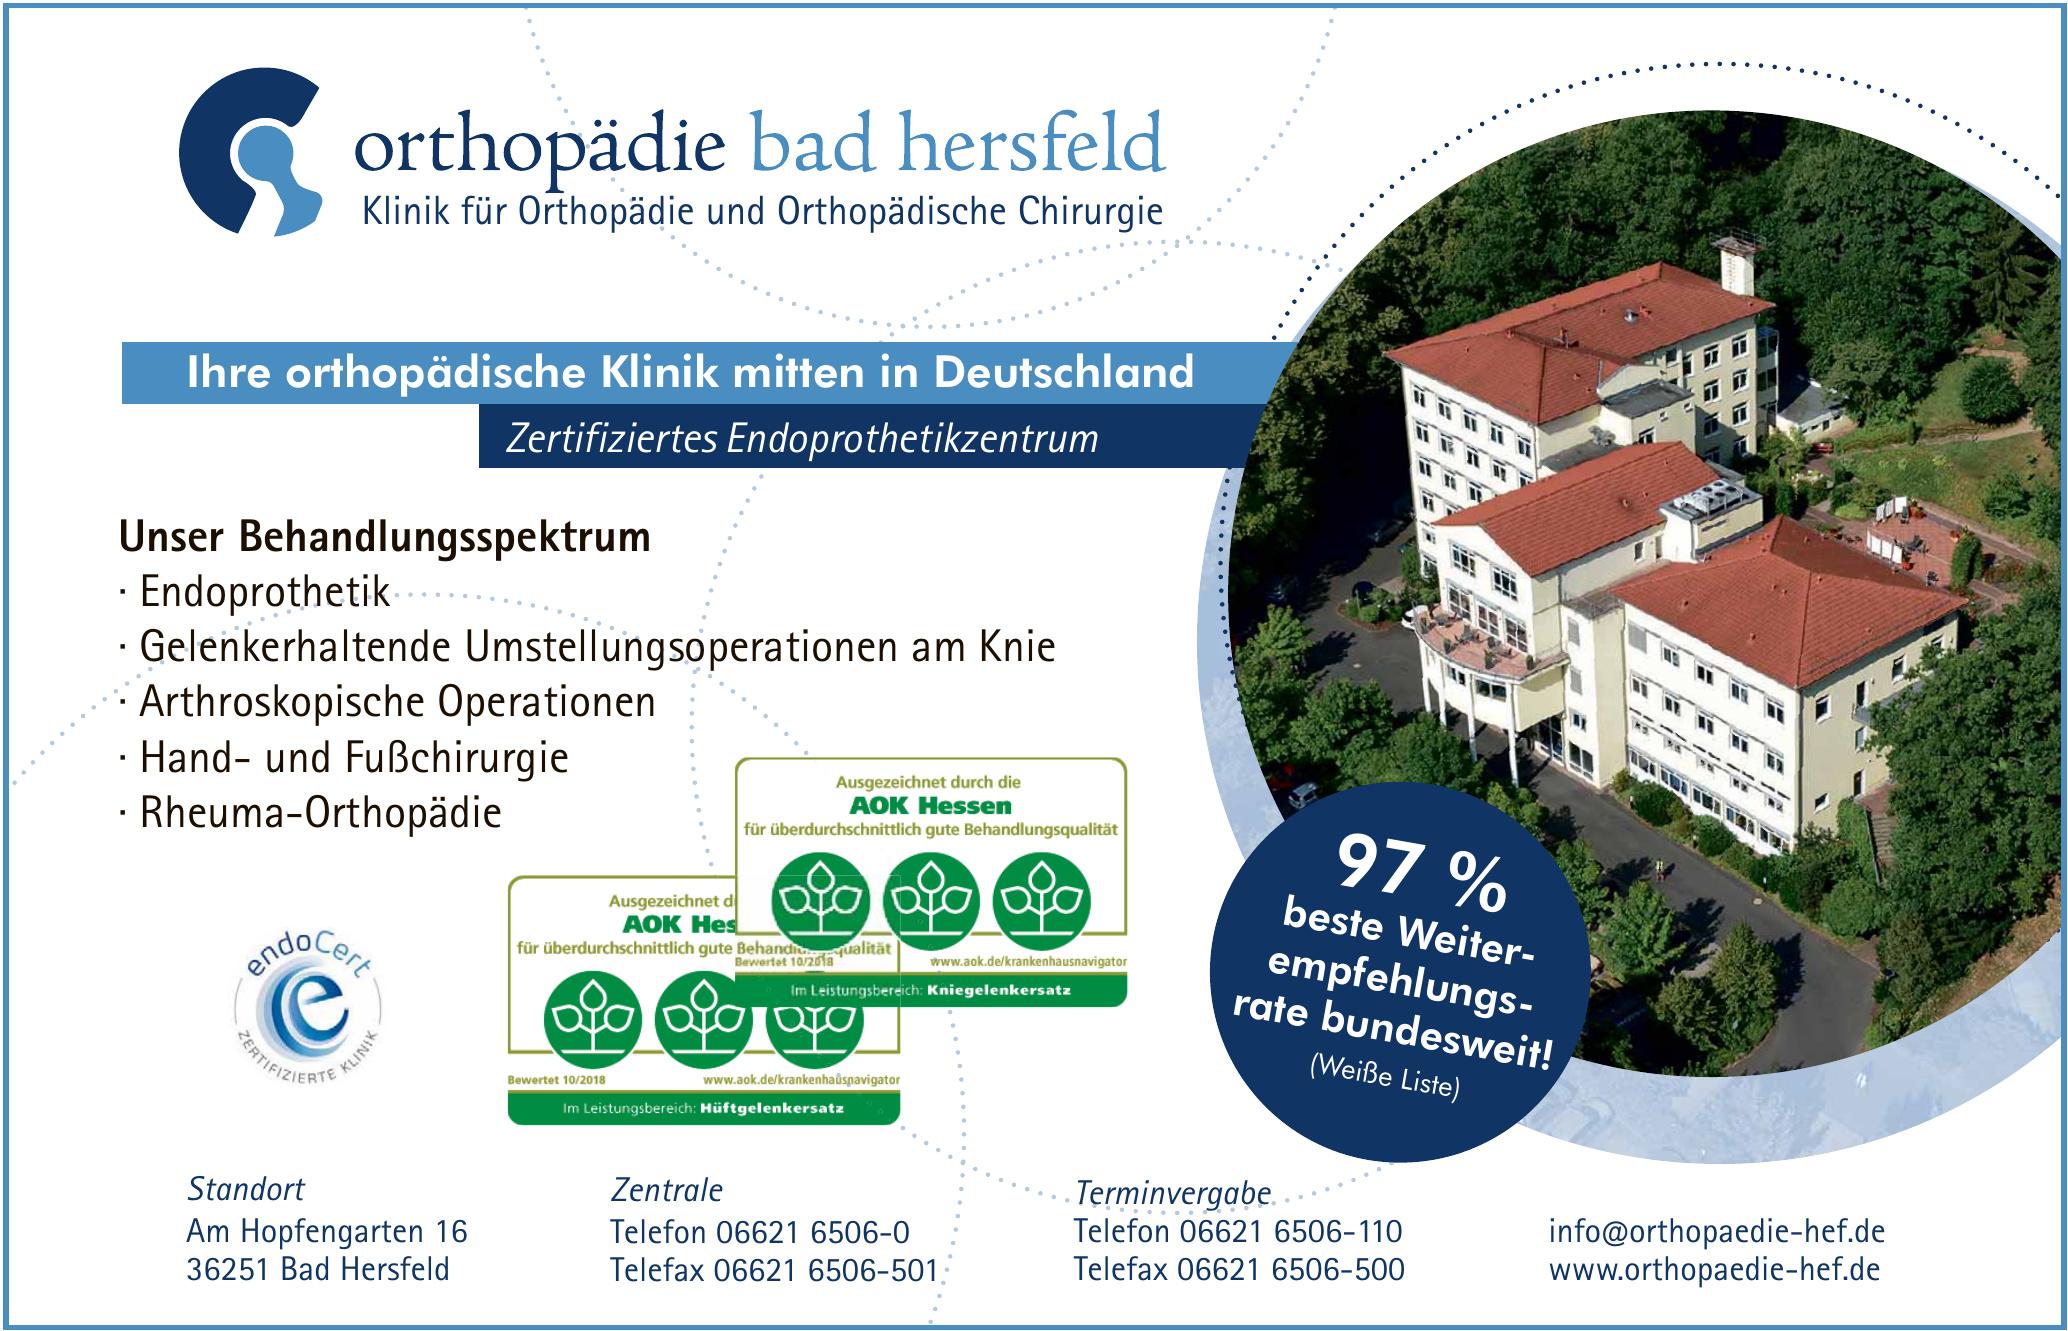 Orthopaedie Bad Hersfeld